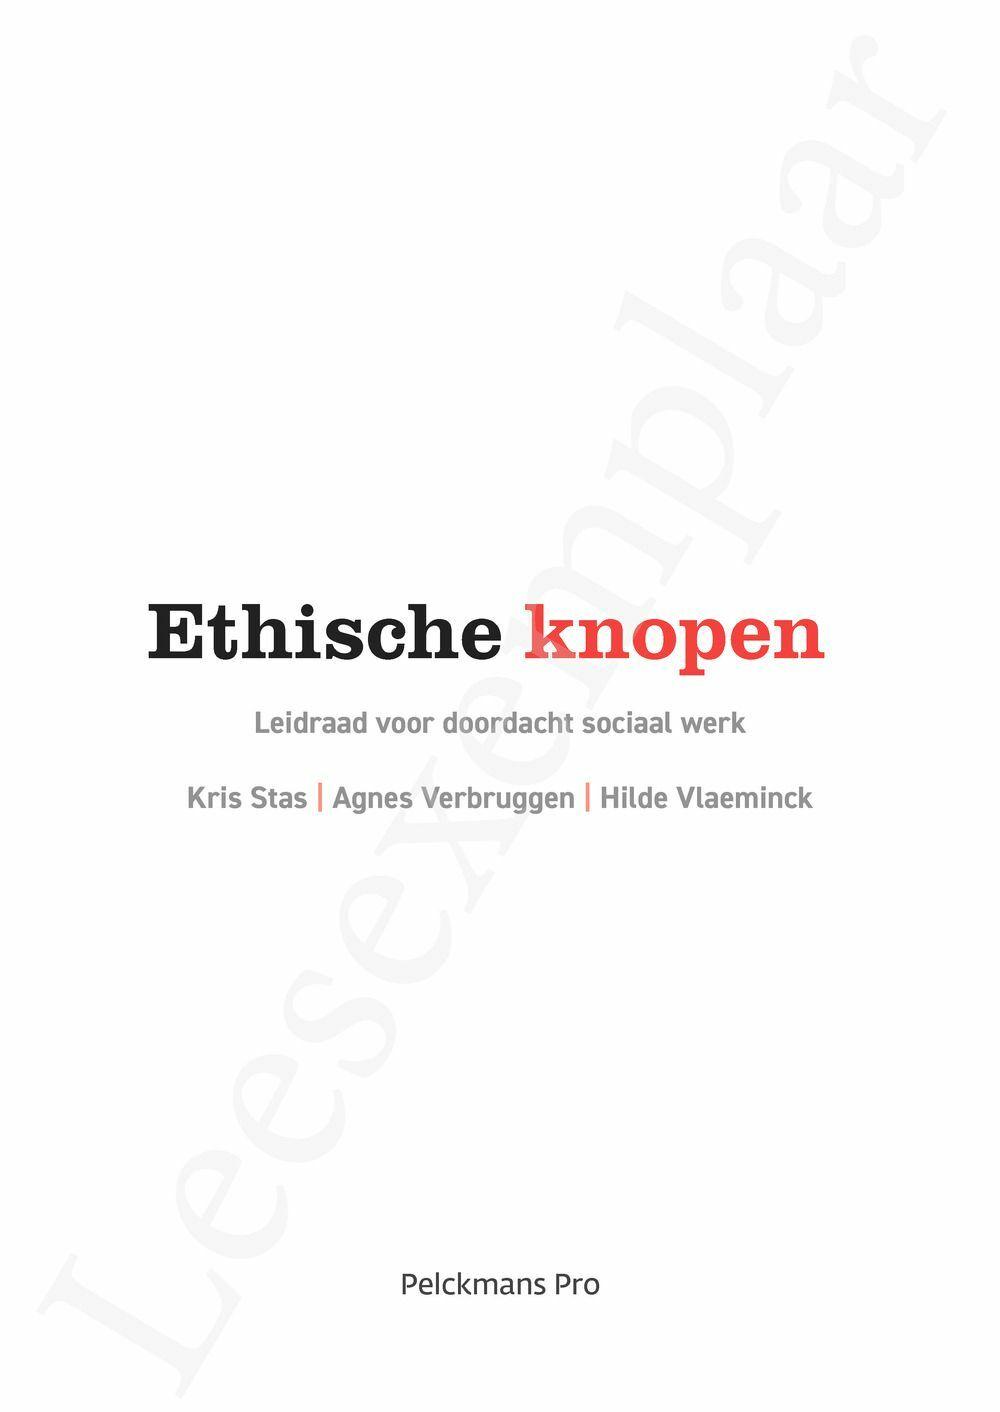 Preview: Ethische knopen